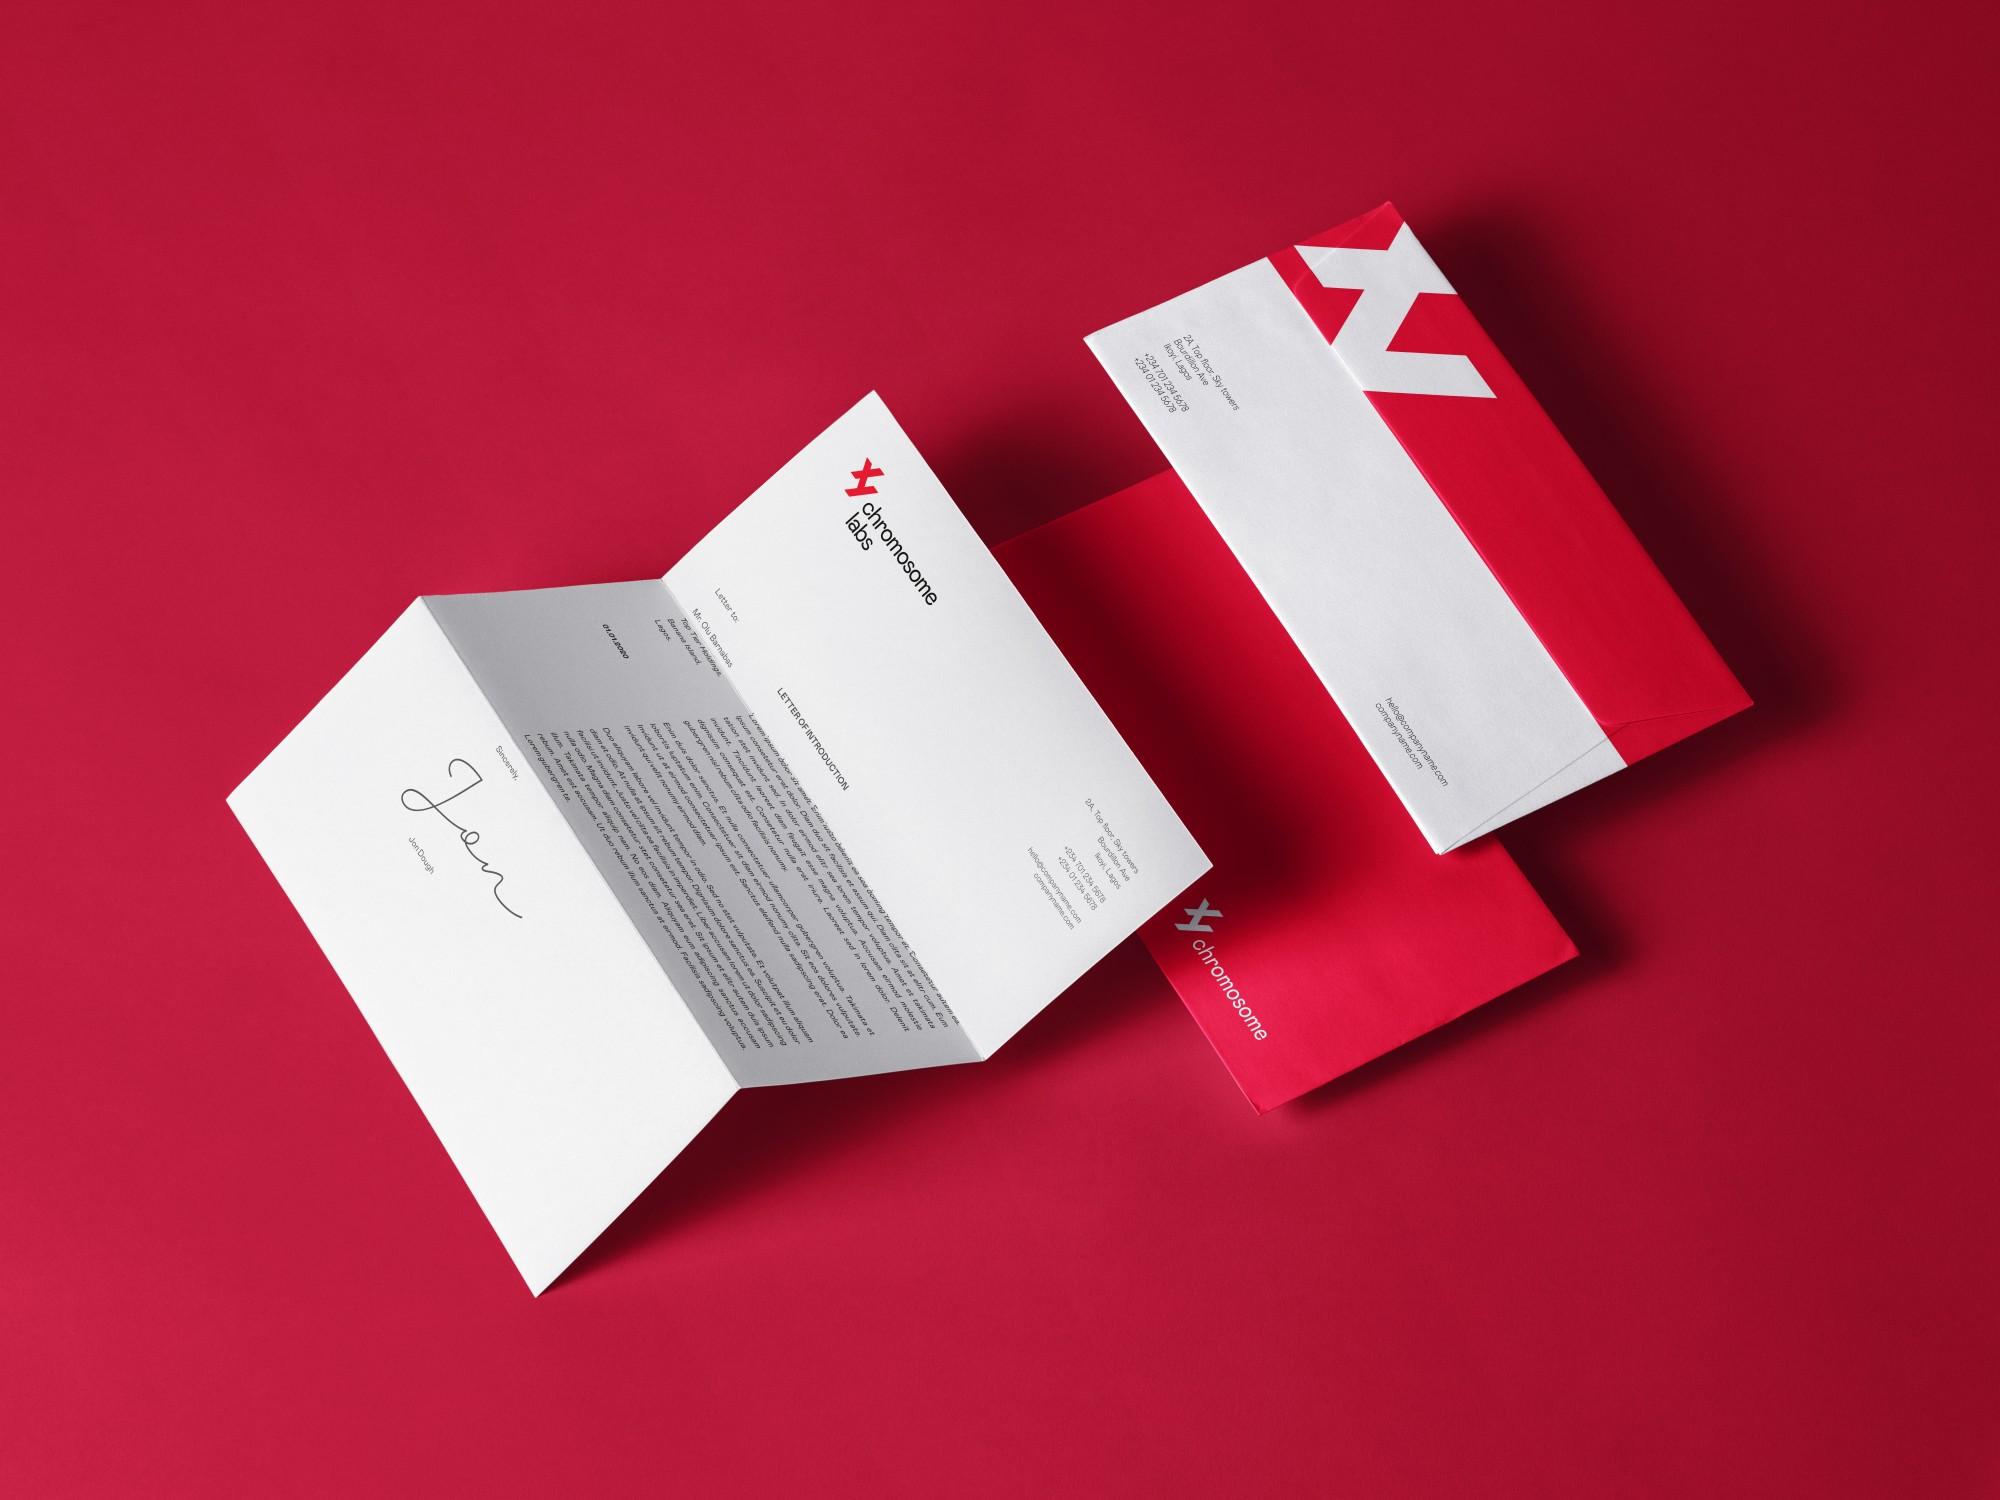 DL (Small) Envelopes made by Kiakiaprint